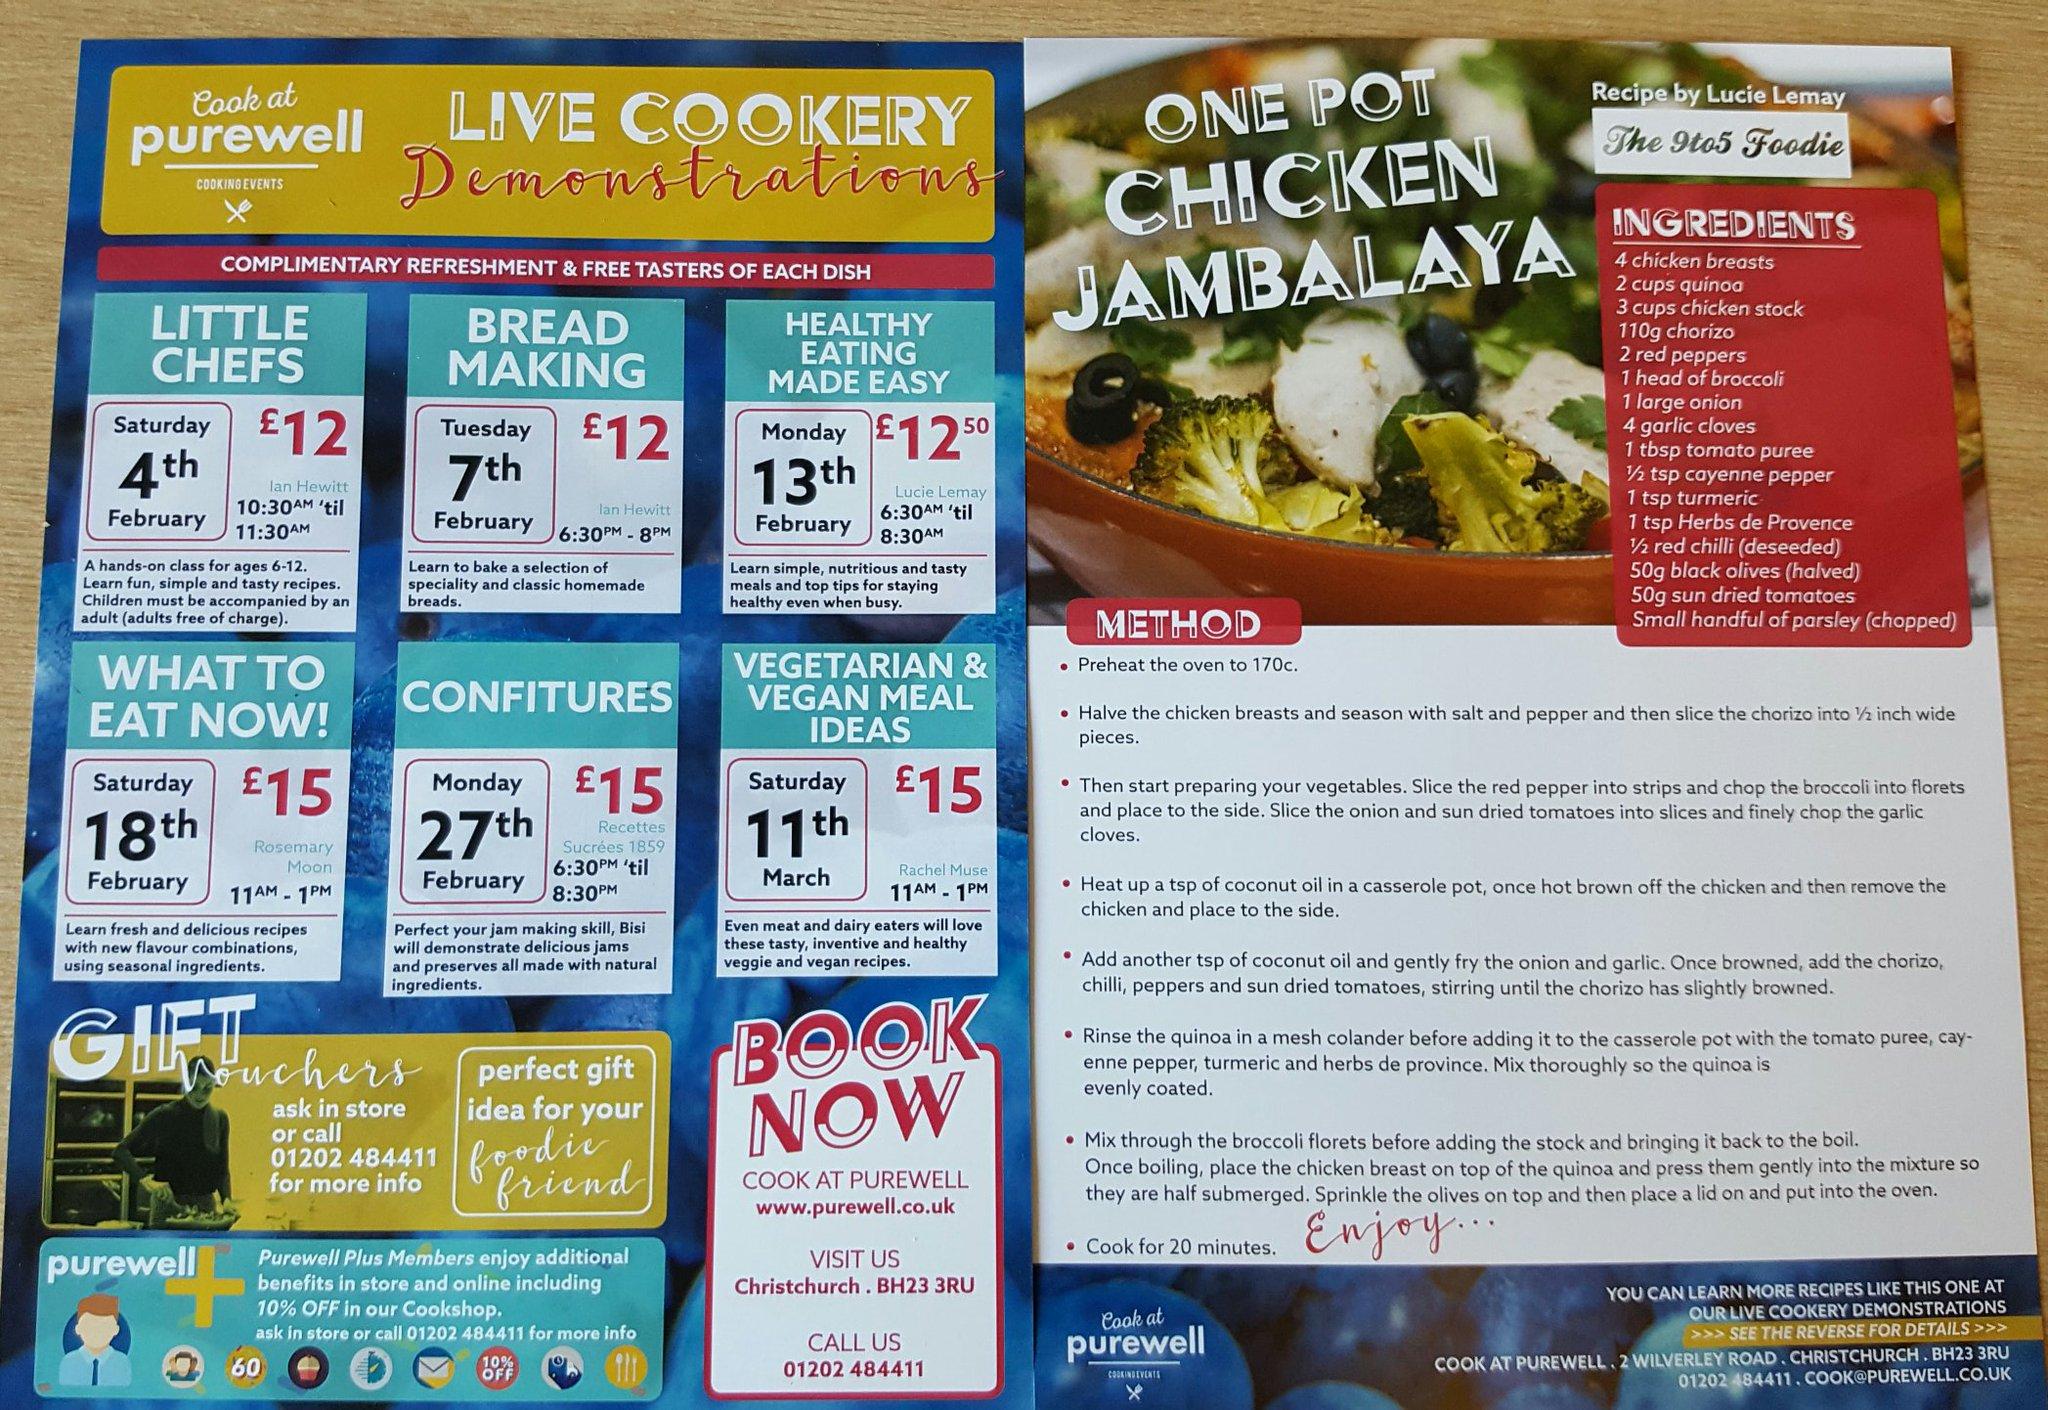 Vegetarian and Vegan Meal Ideas. Purewell, Christchurch